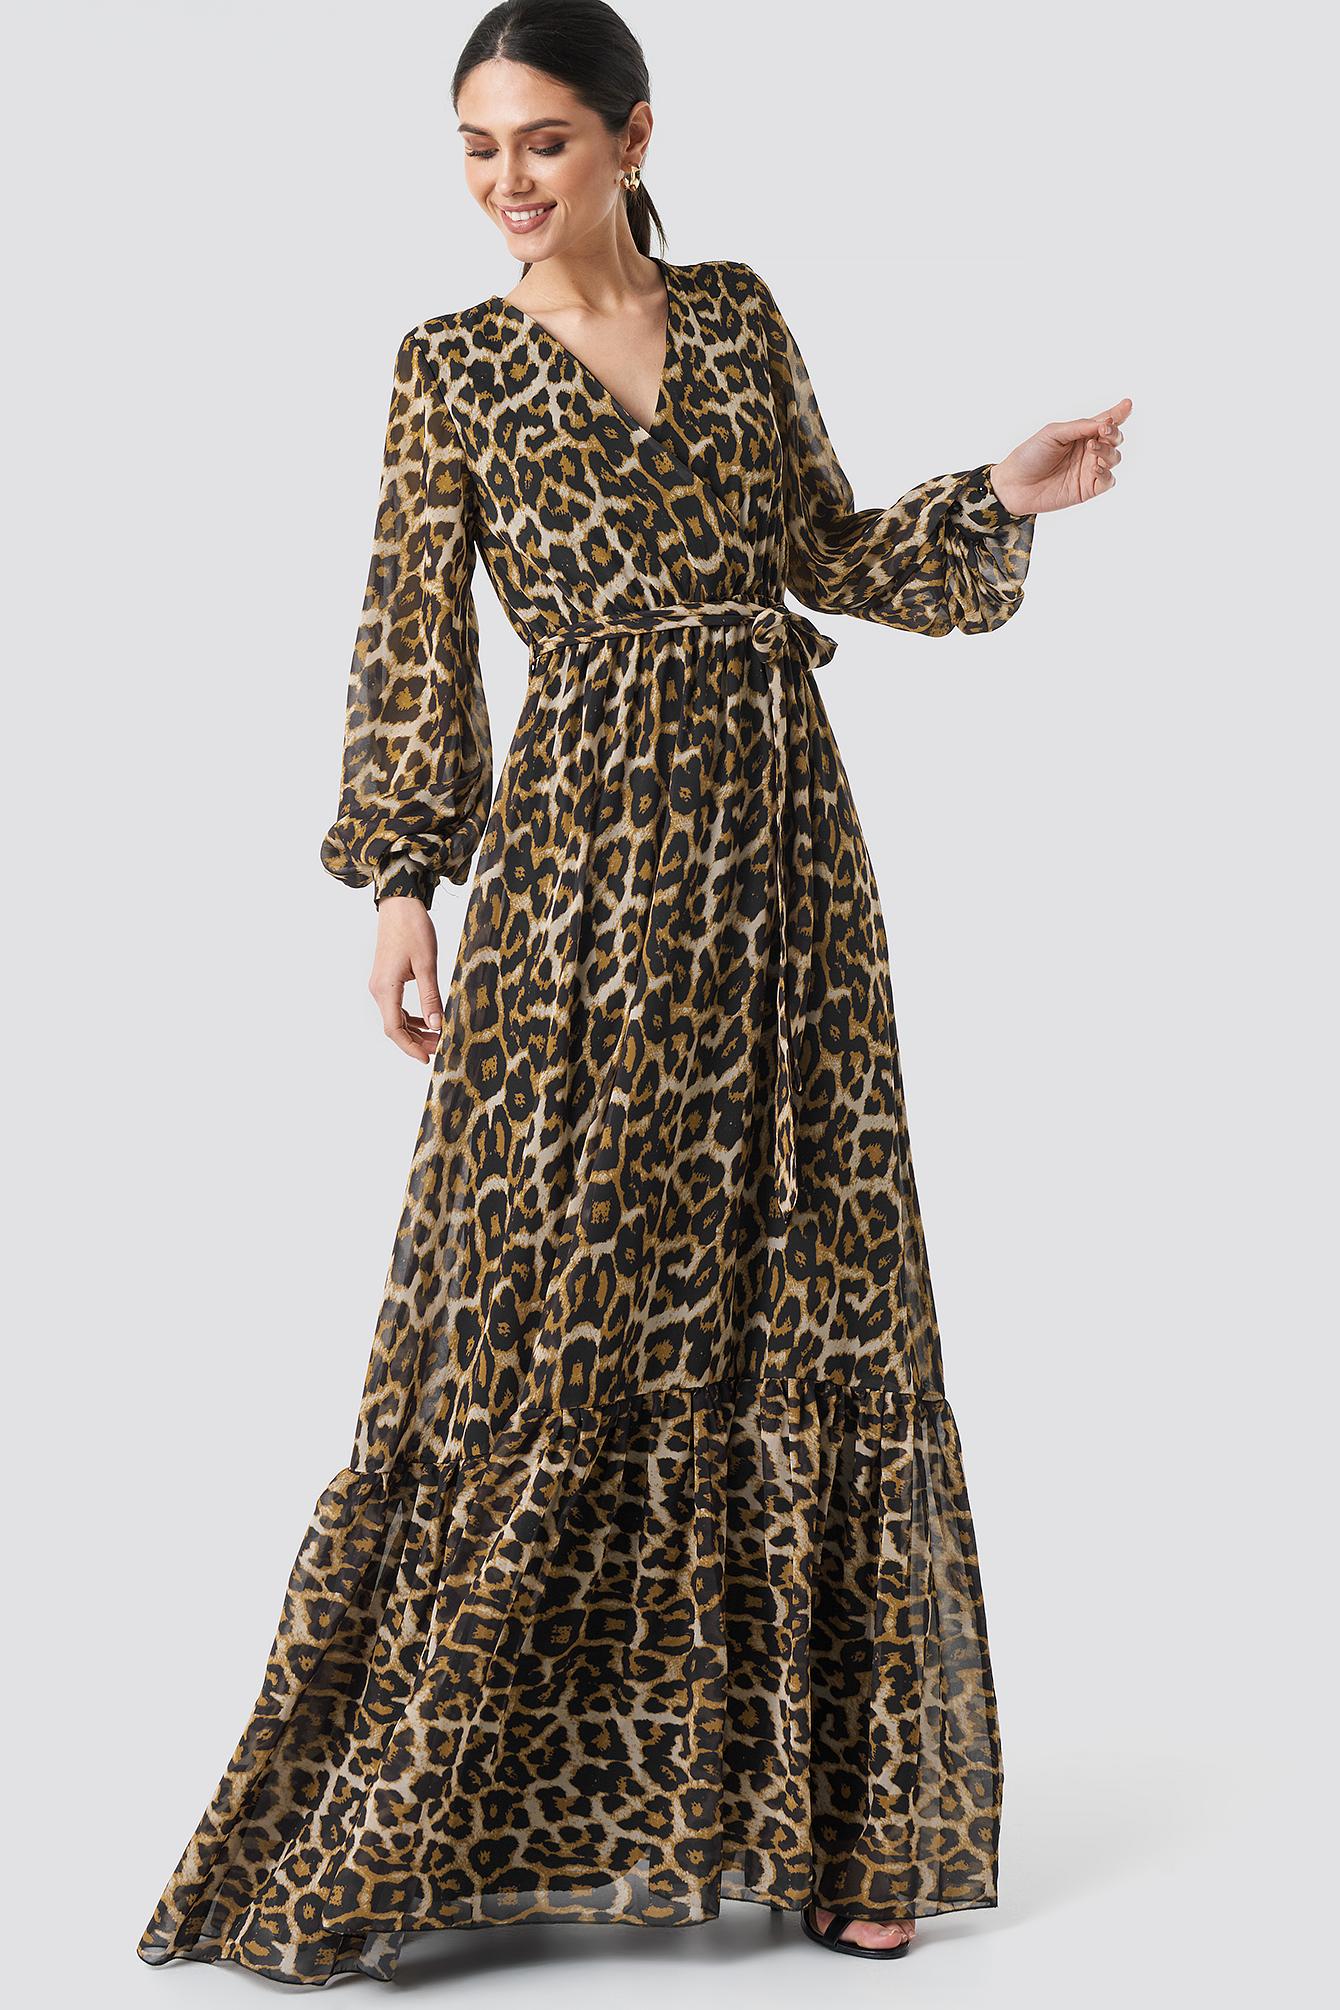 Leopard Patterned Evening Dress NA-KD.COM